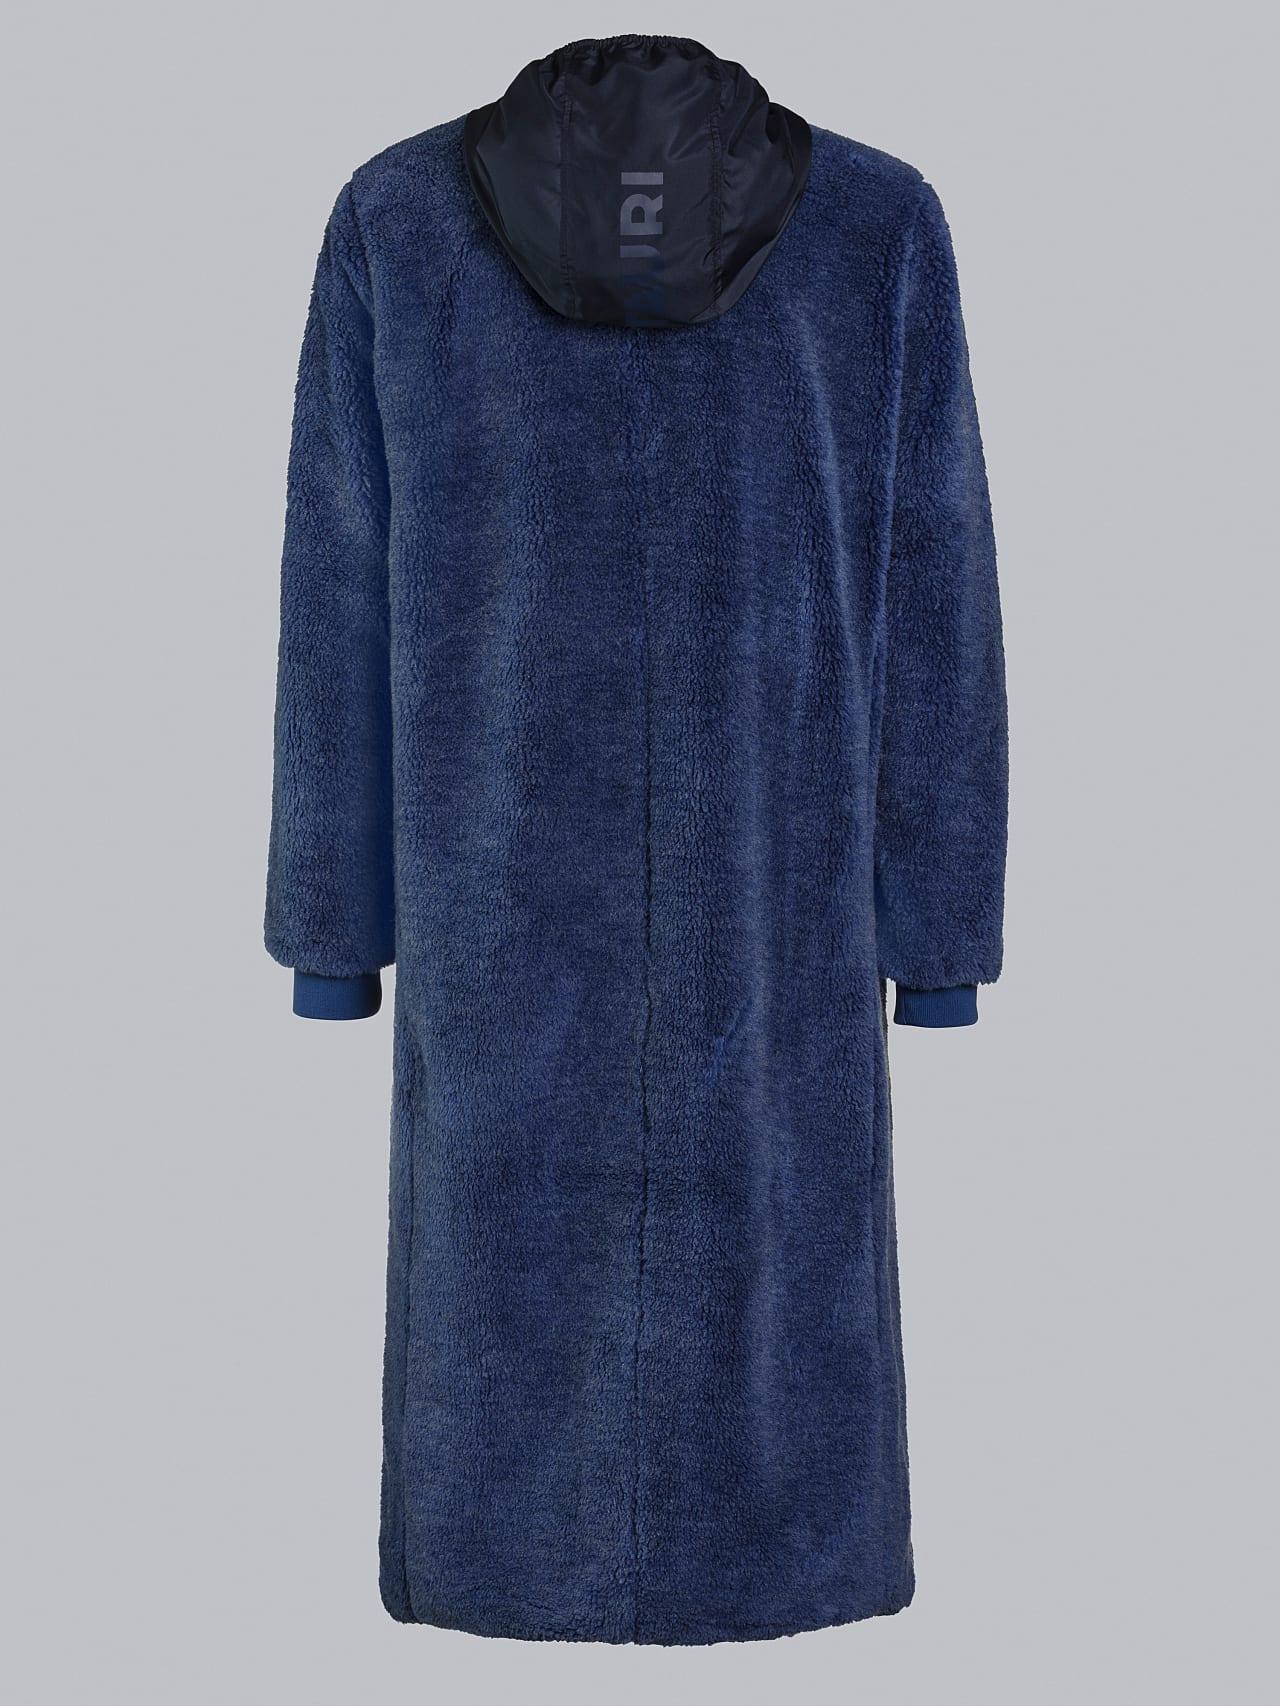 OMANE V1.Y5.02 Reversible Pile Wool Maxi Coat light blue Left Alpha Tauri